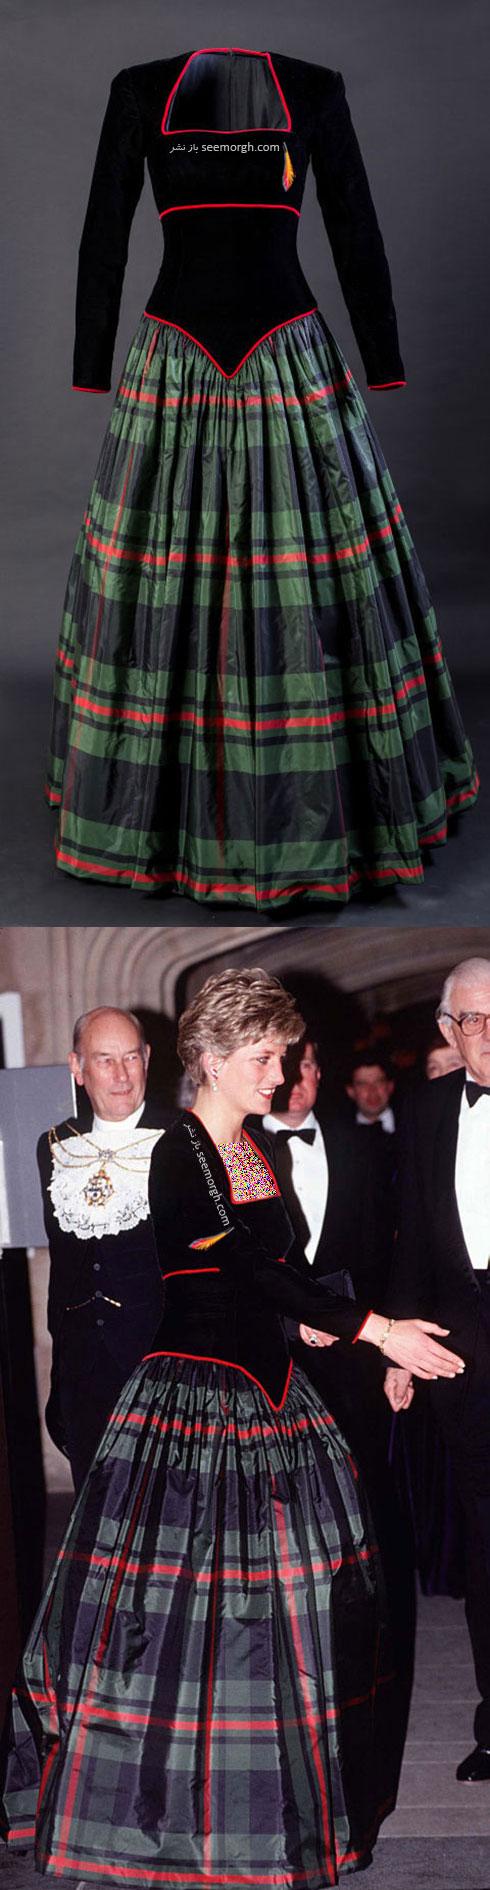 لباس مشکی پرنسس دایانا Diana از طراح معروف کاتری واکر CATHERINE WALKER